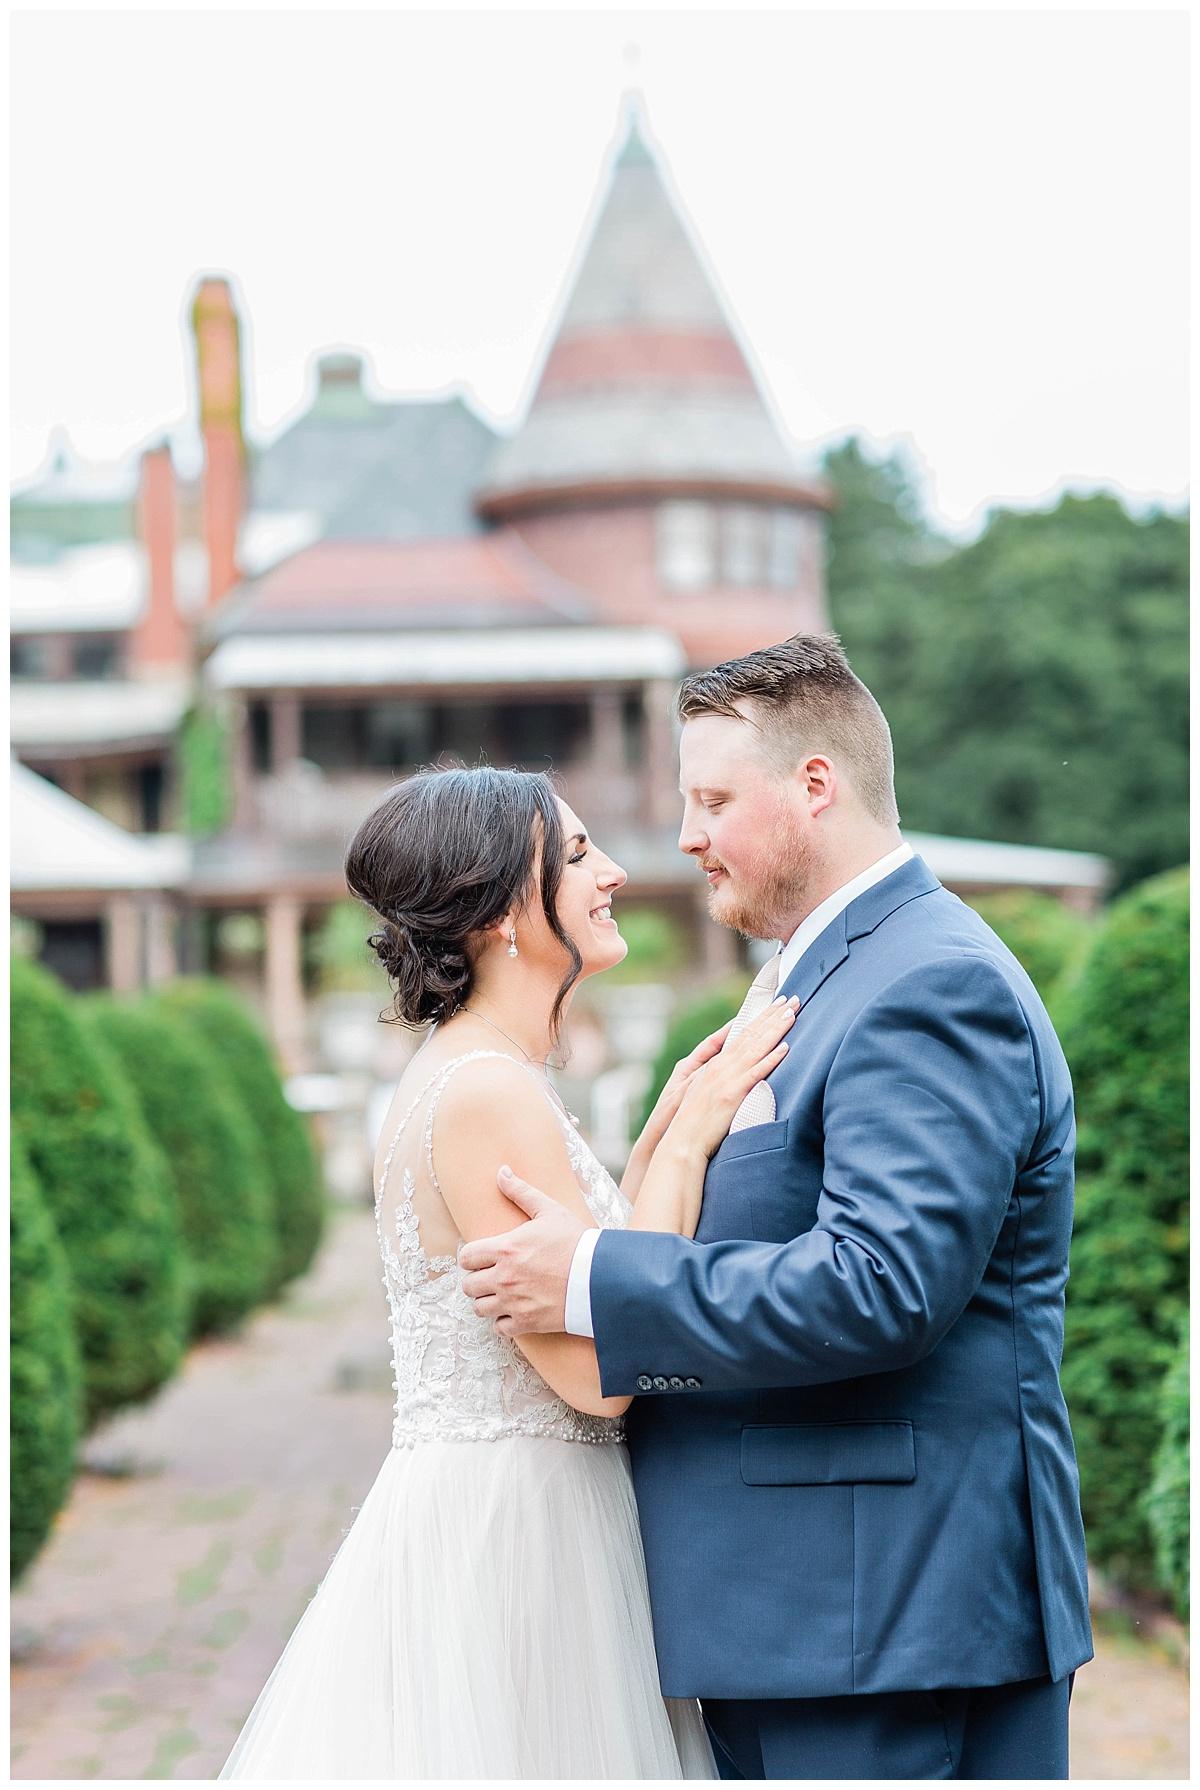 Rachel and Nick - Sonnenberg Gardens Wedding-412.jpg